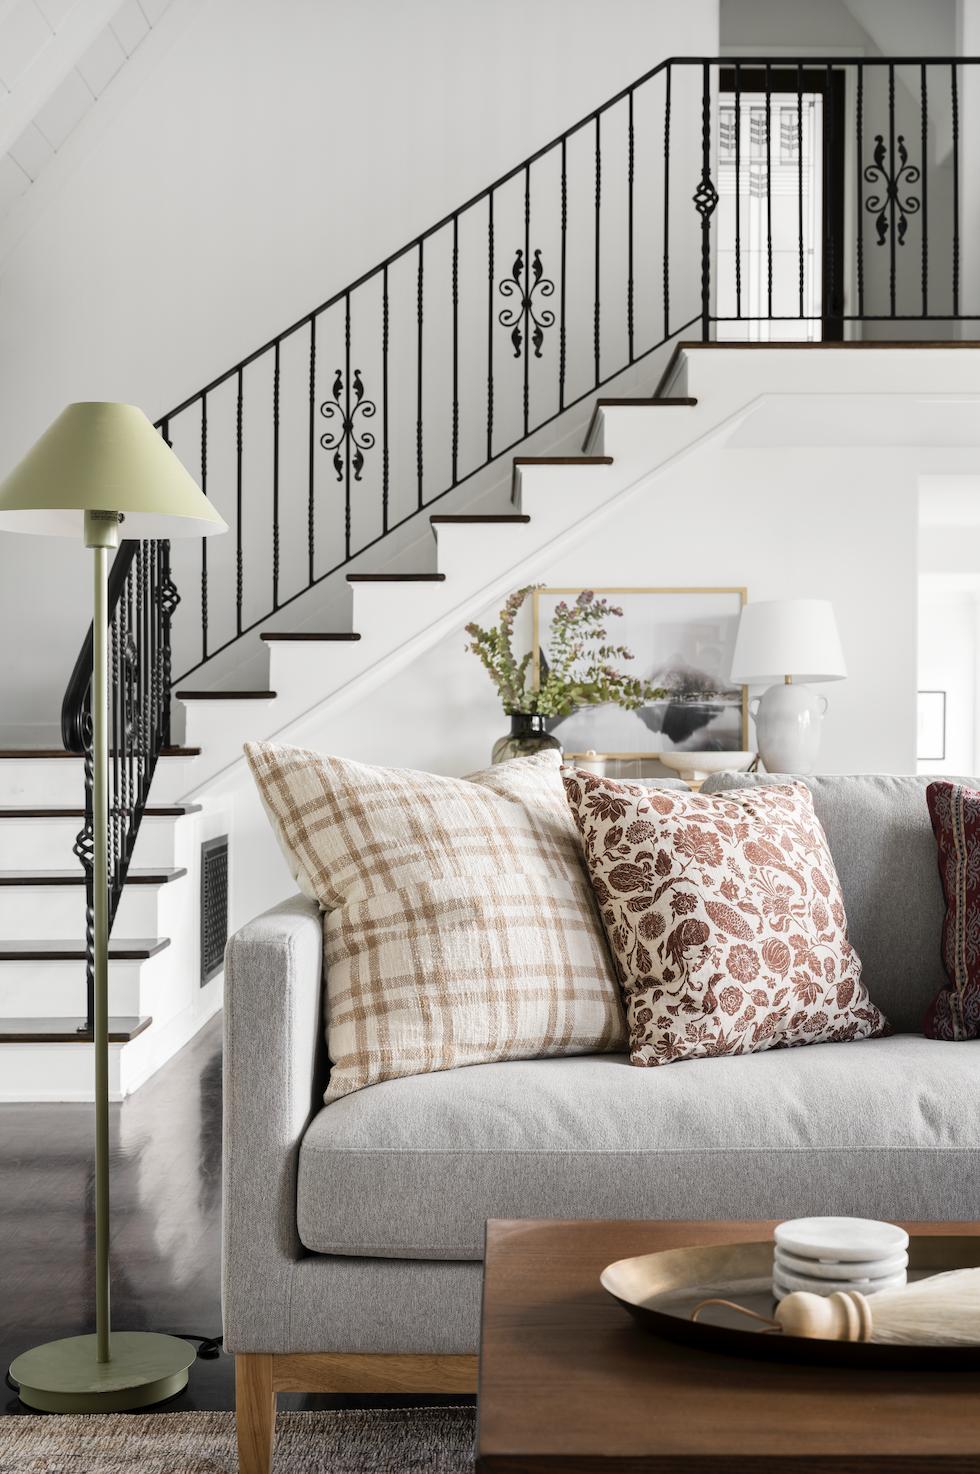 5 Ways to Make Your Home Feel Like Fall